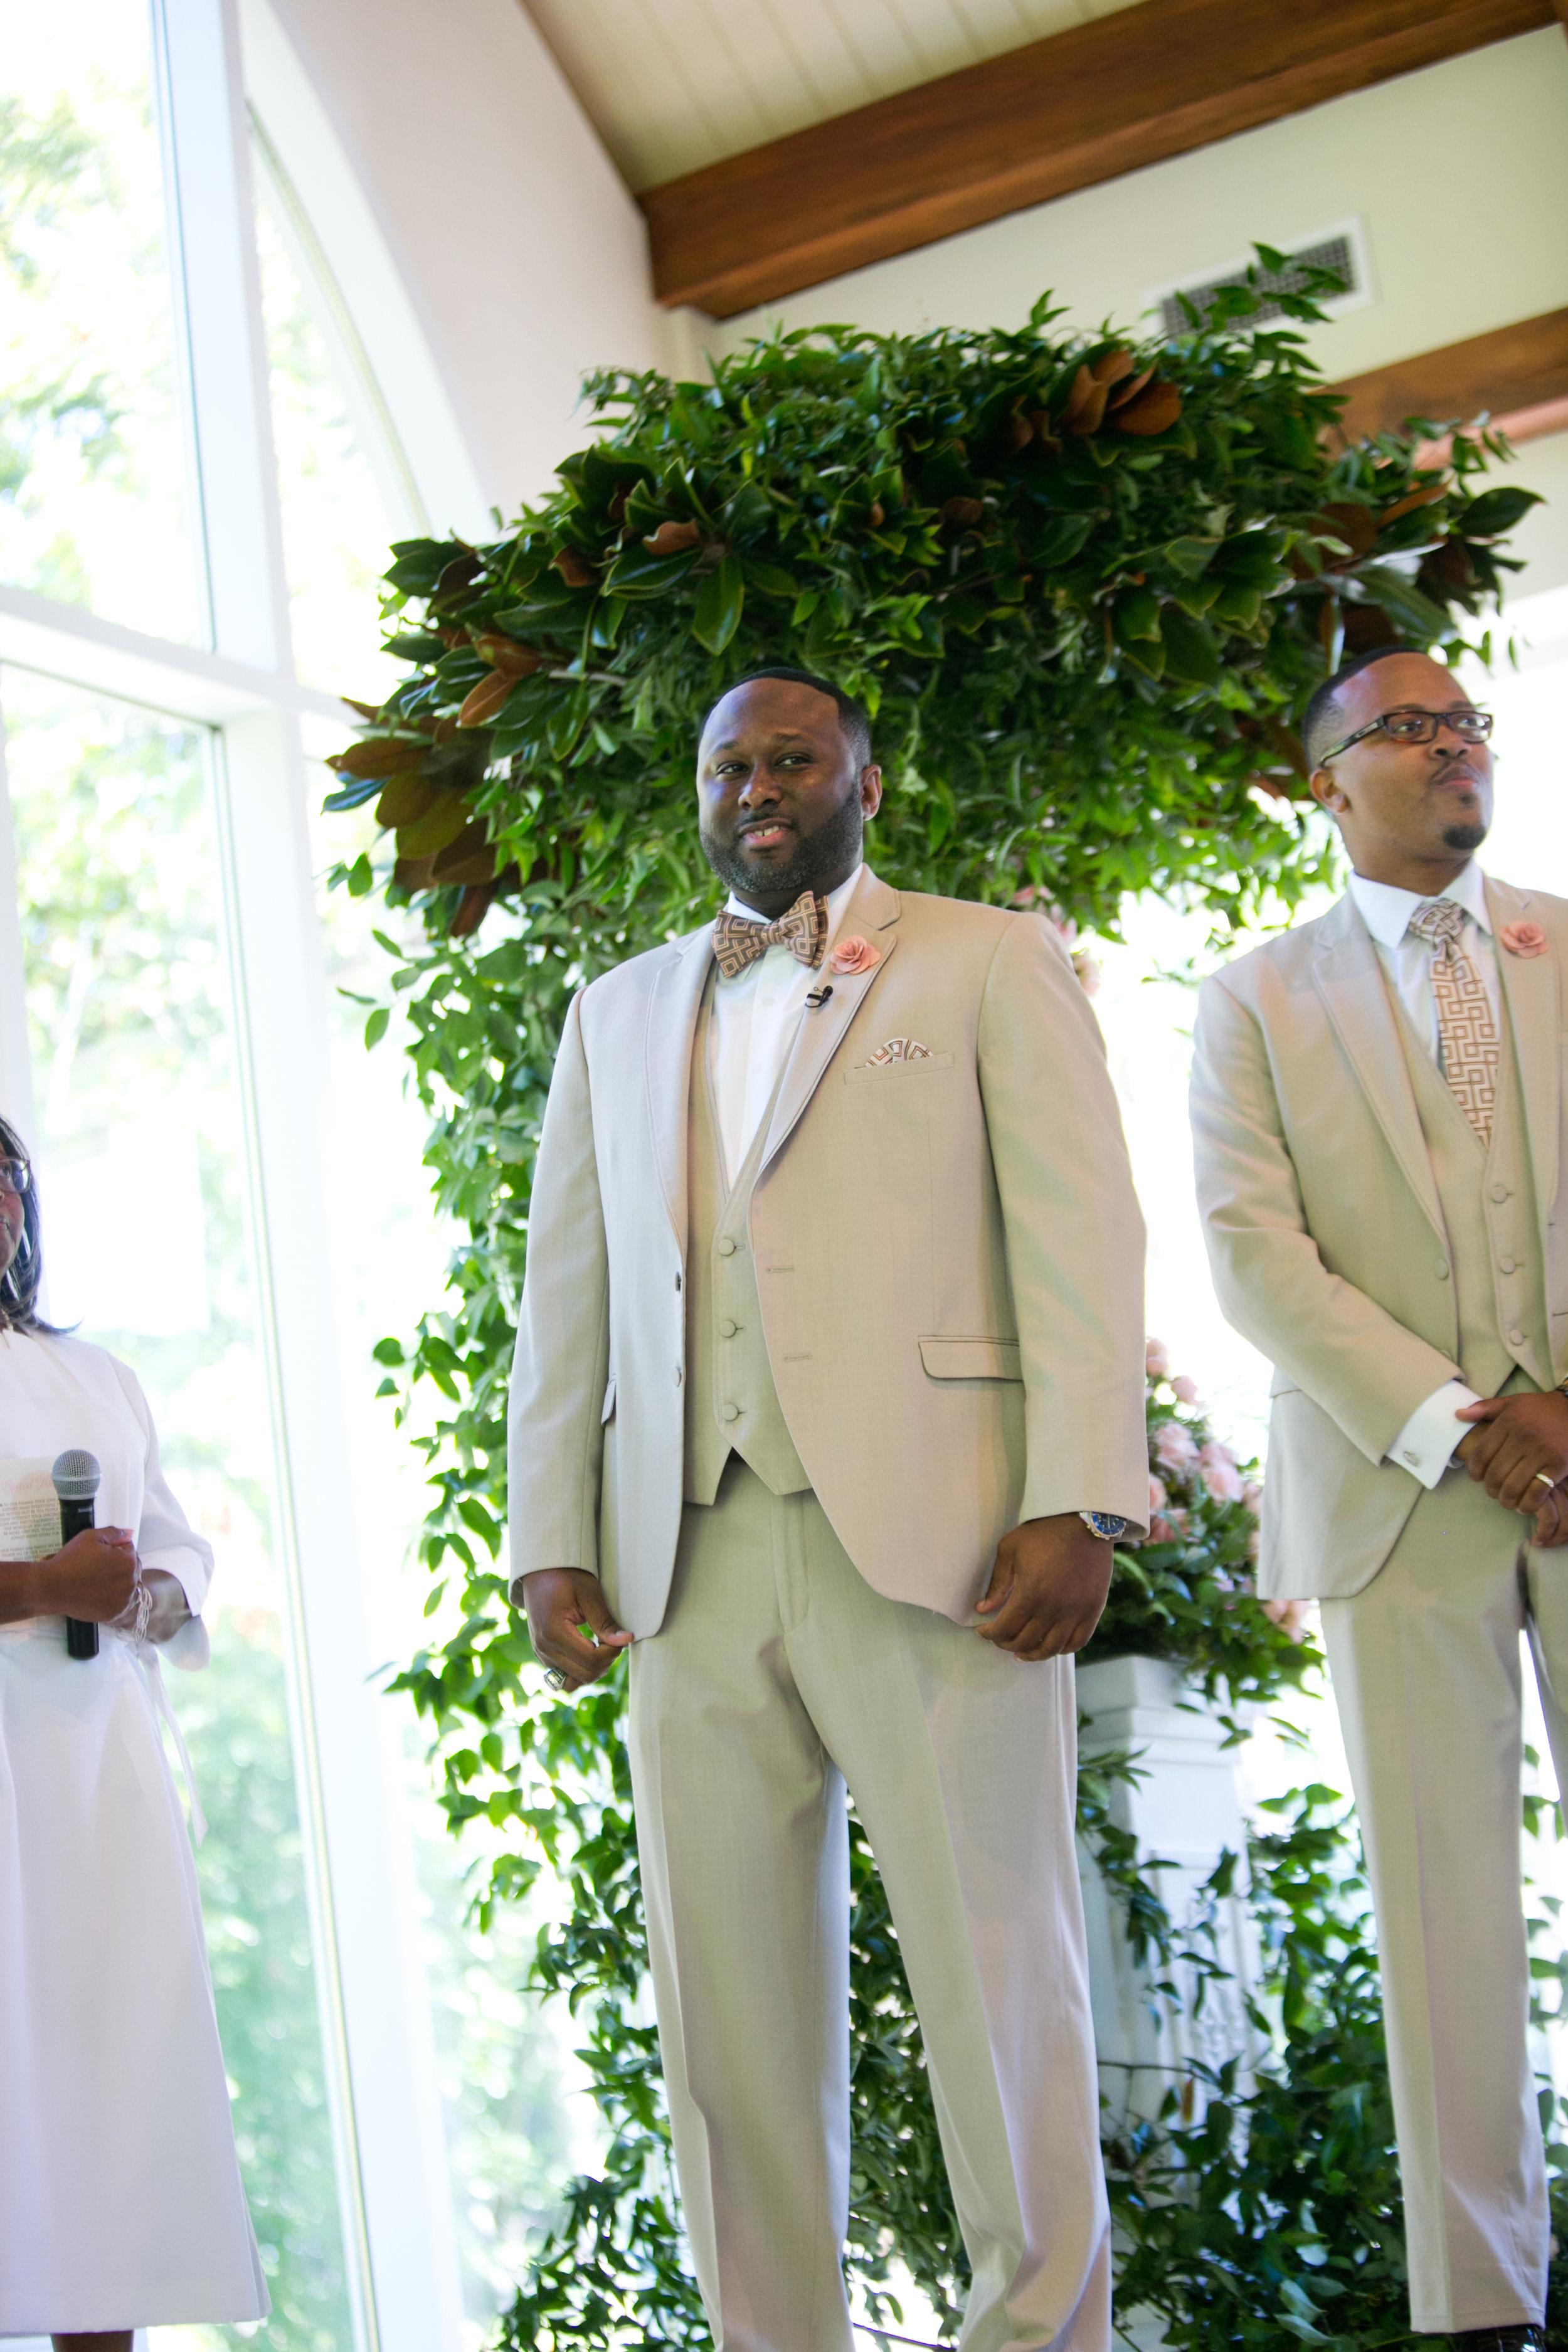 Candice & Alvin Ceremony-44 - Copy.jpg